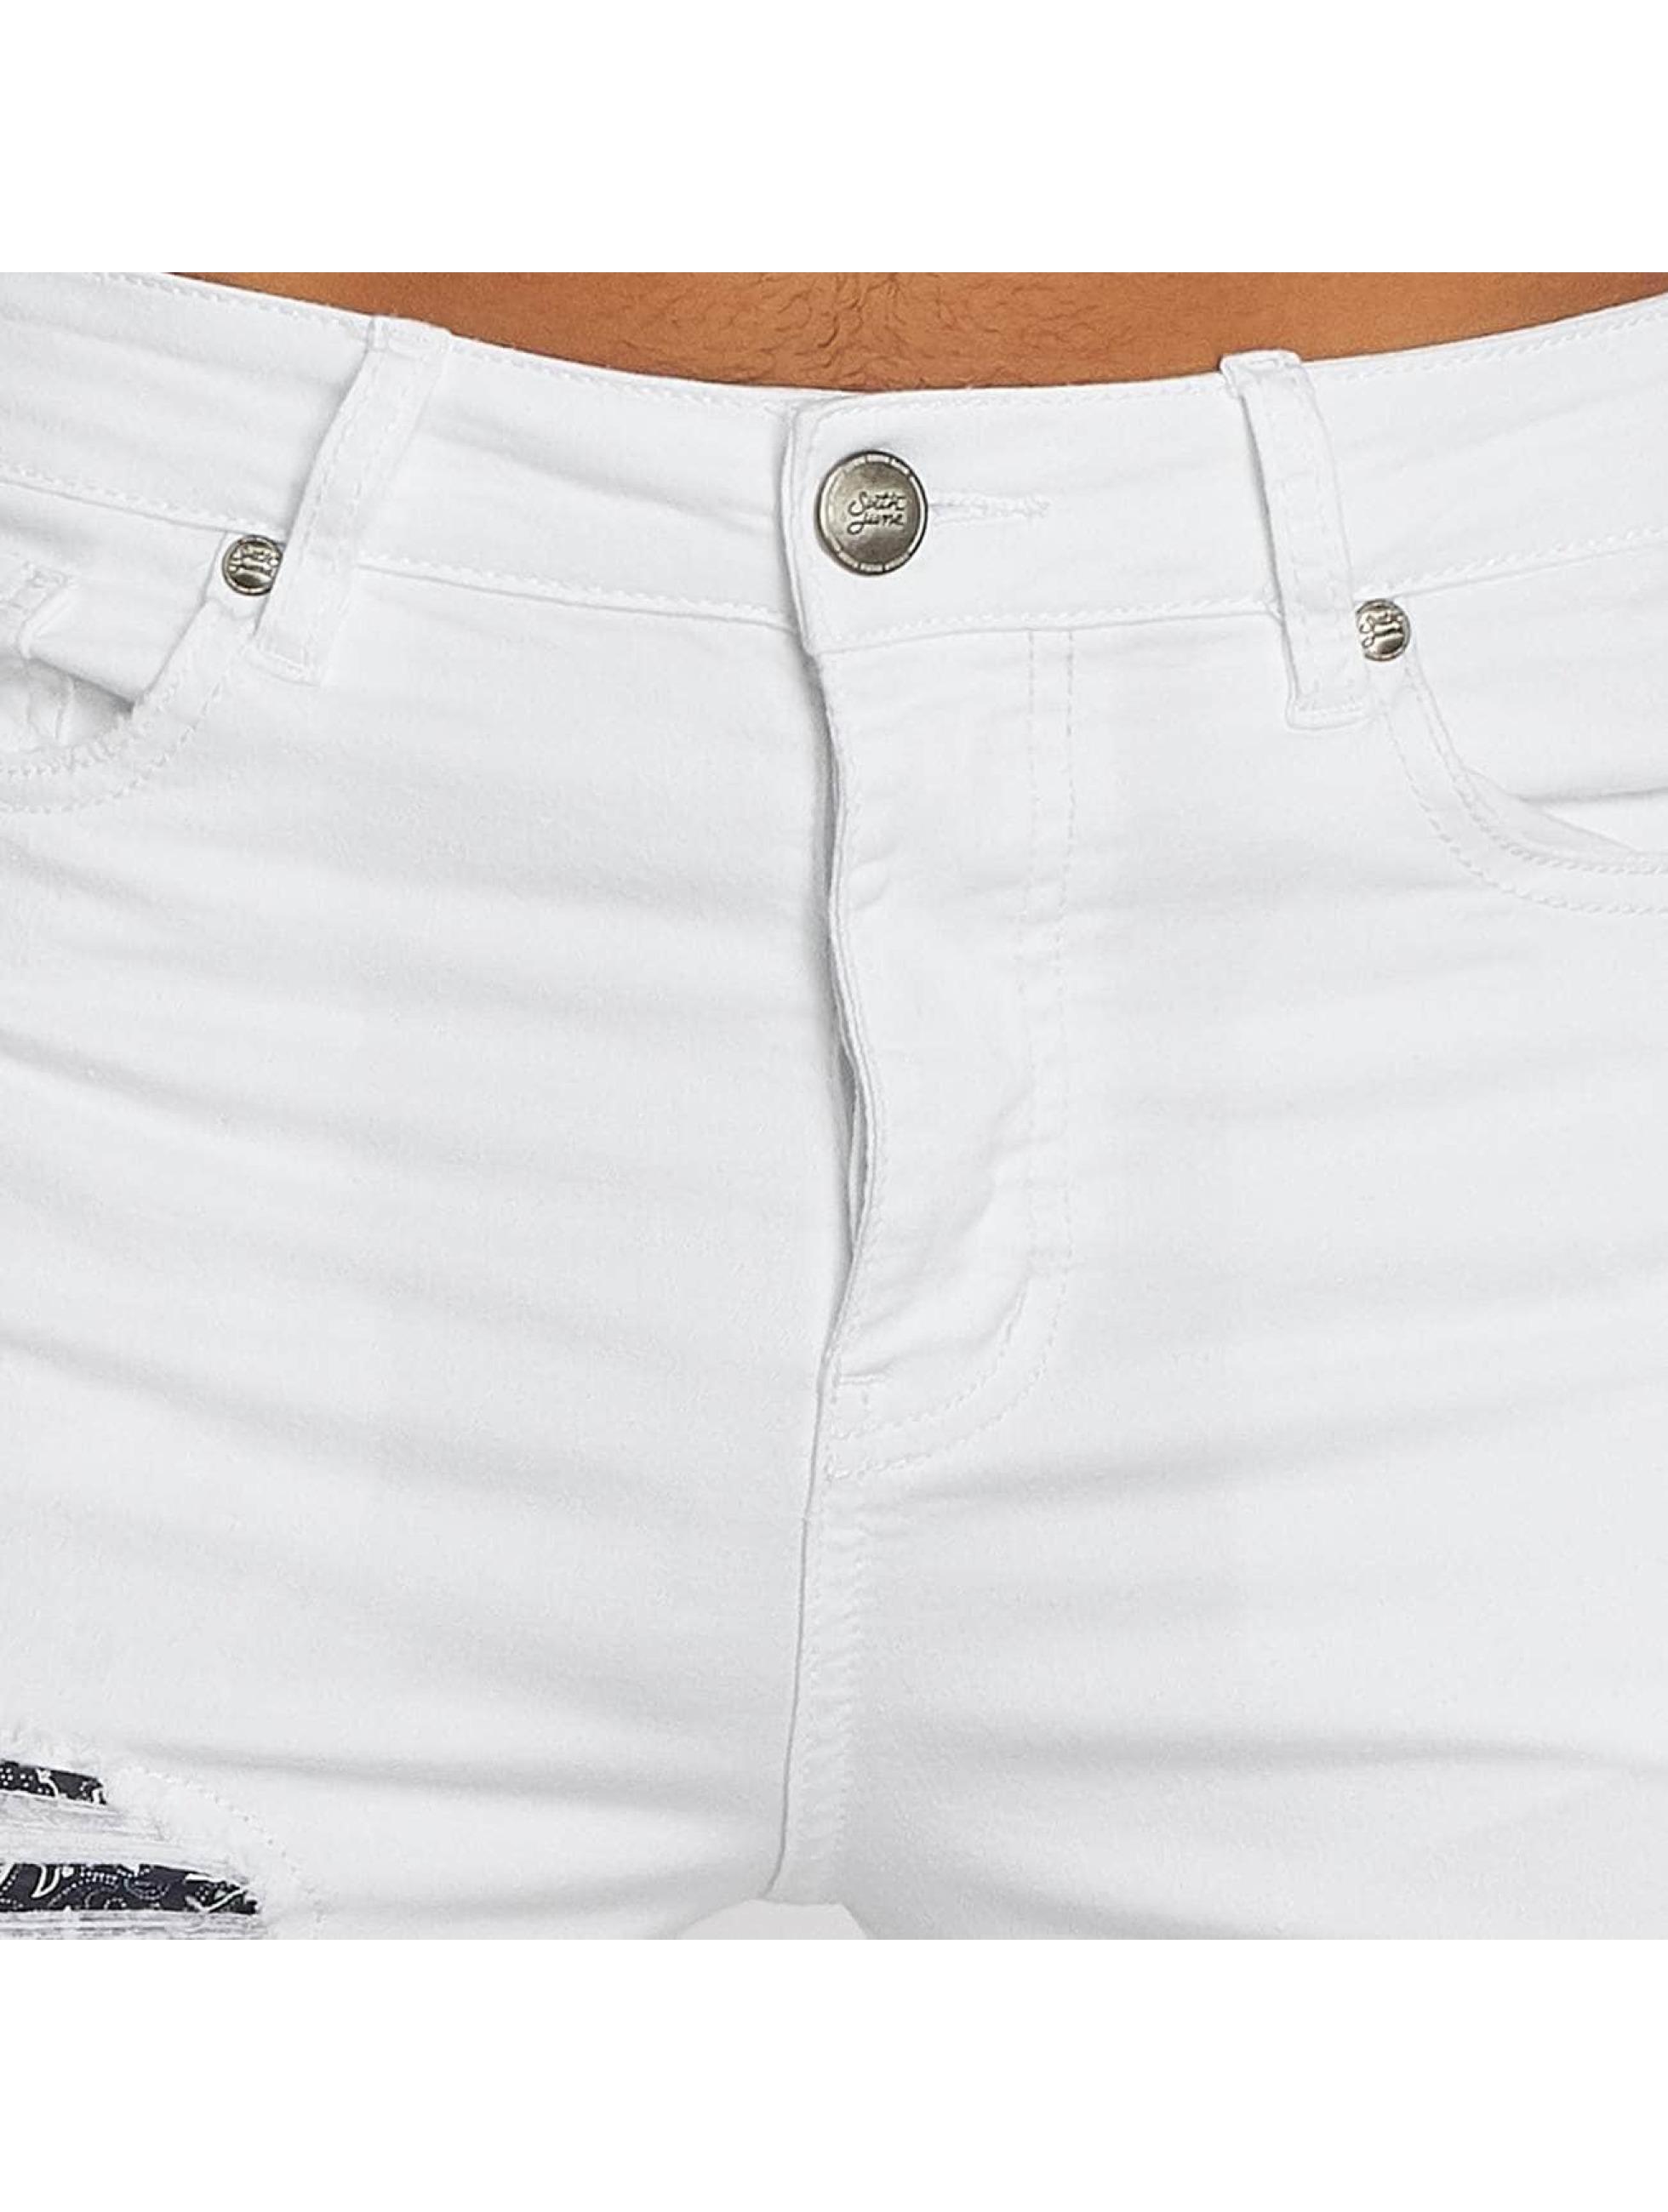 Sixth June Jeans ajustado Hudson blanco